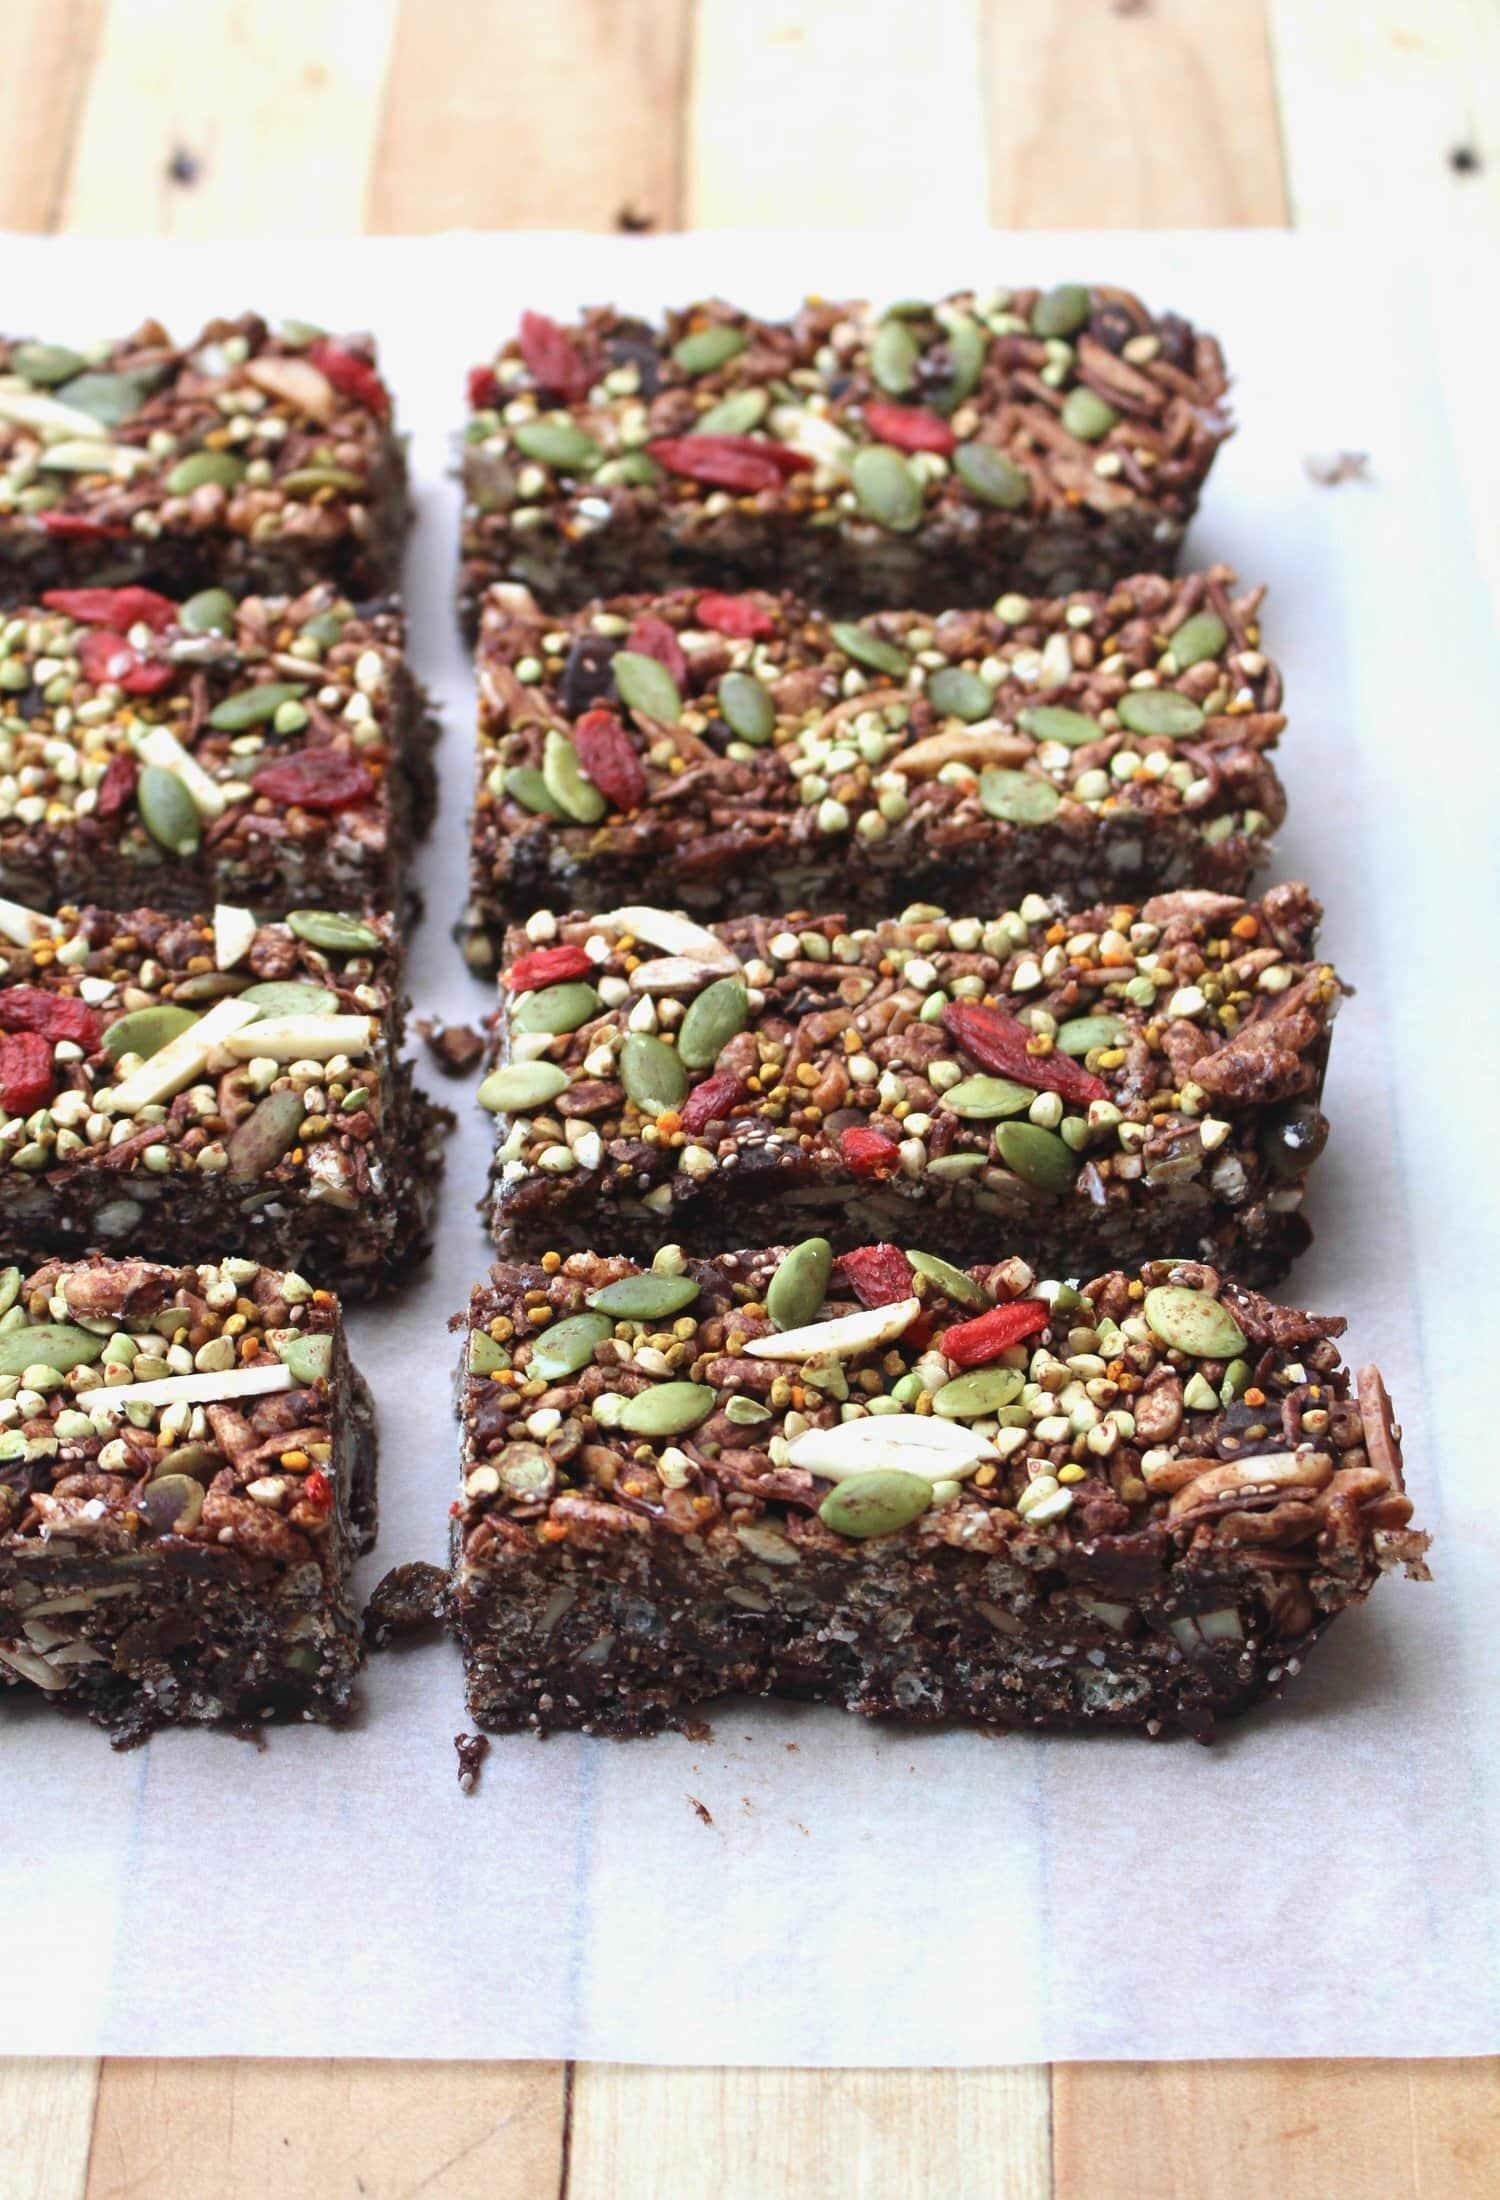 Slabs of chocolate rice crispy bars.